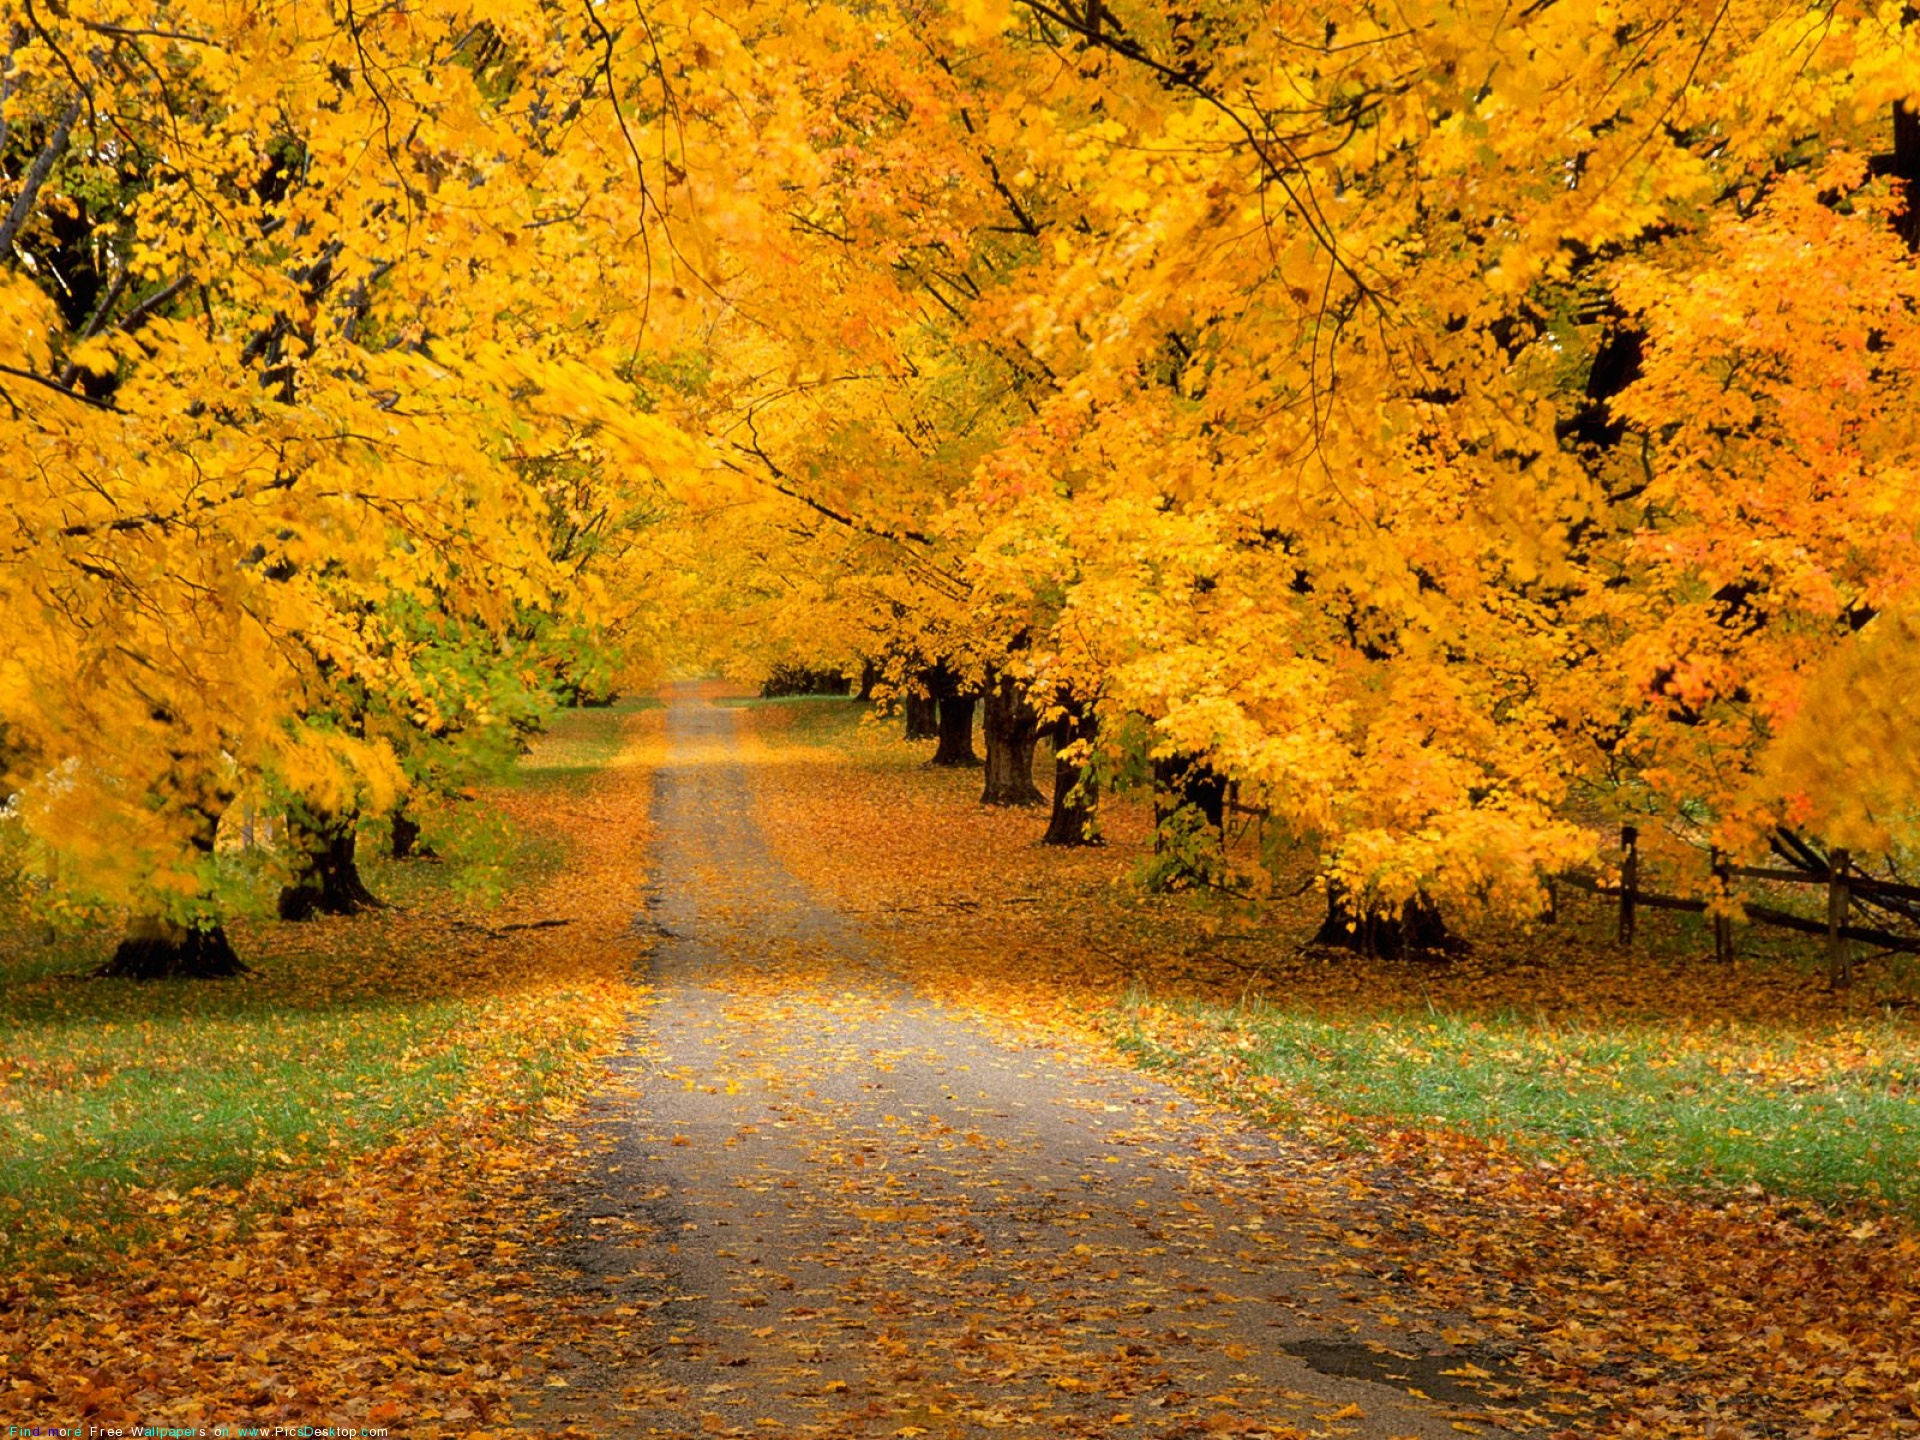 Nature wallpaper autumn